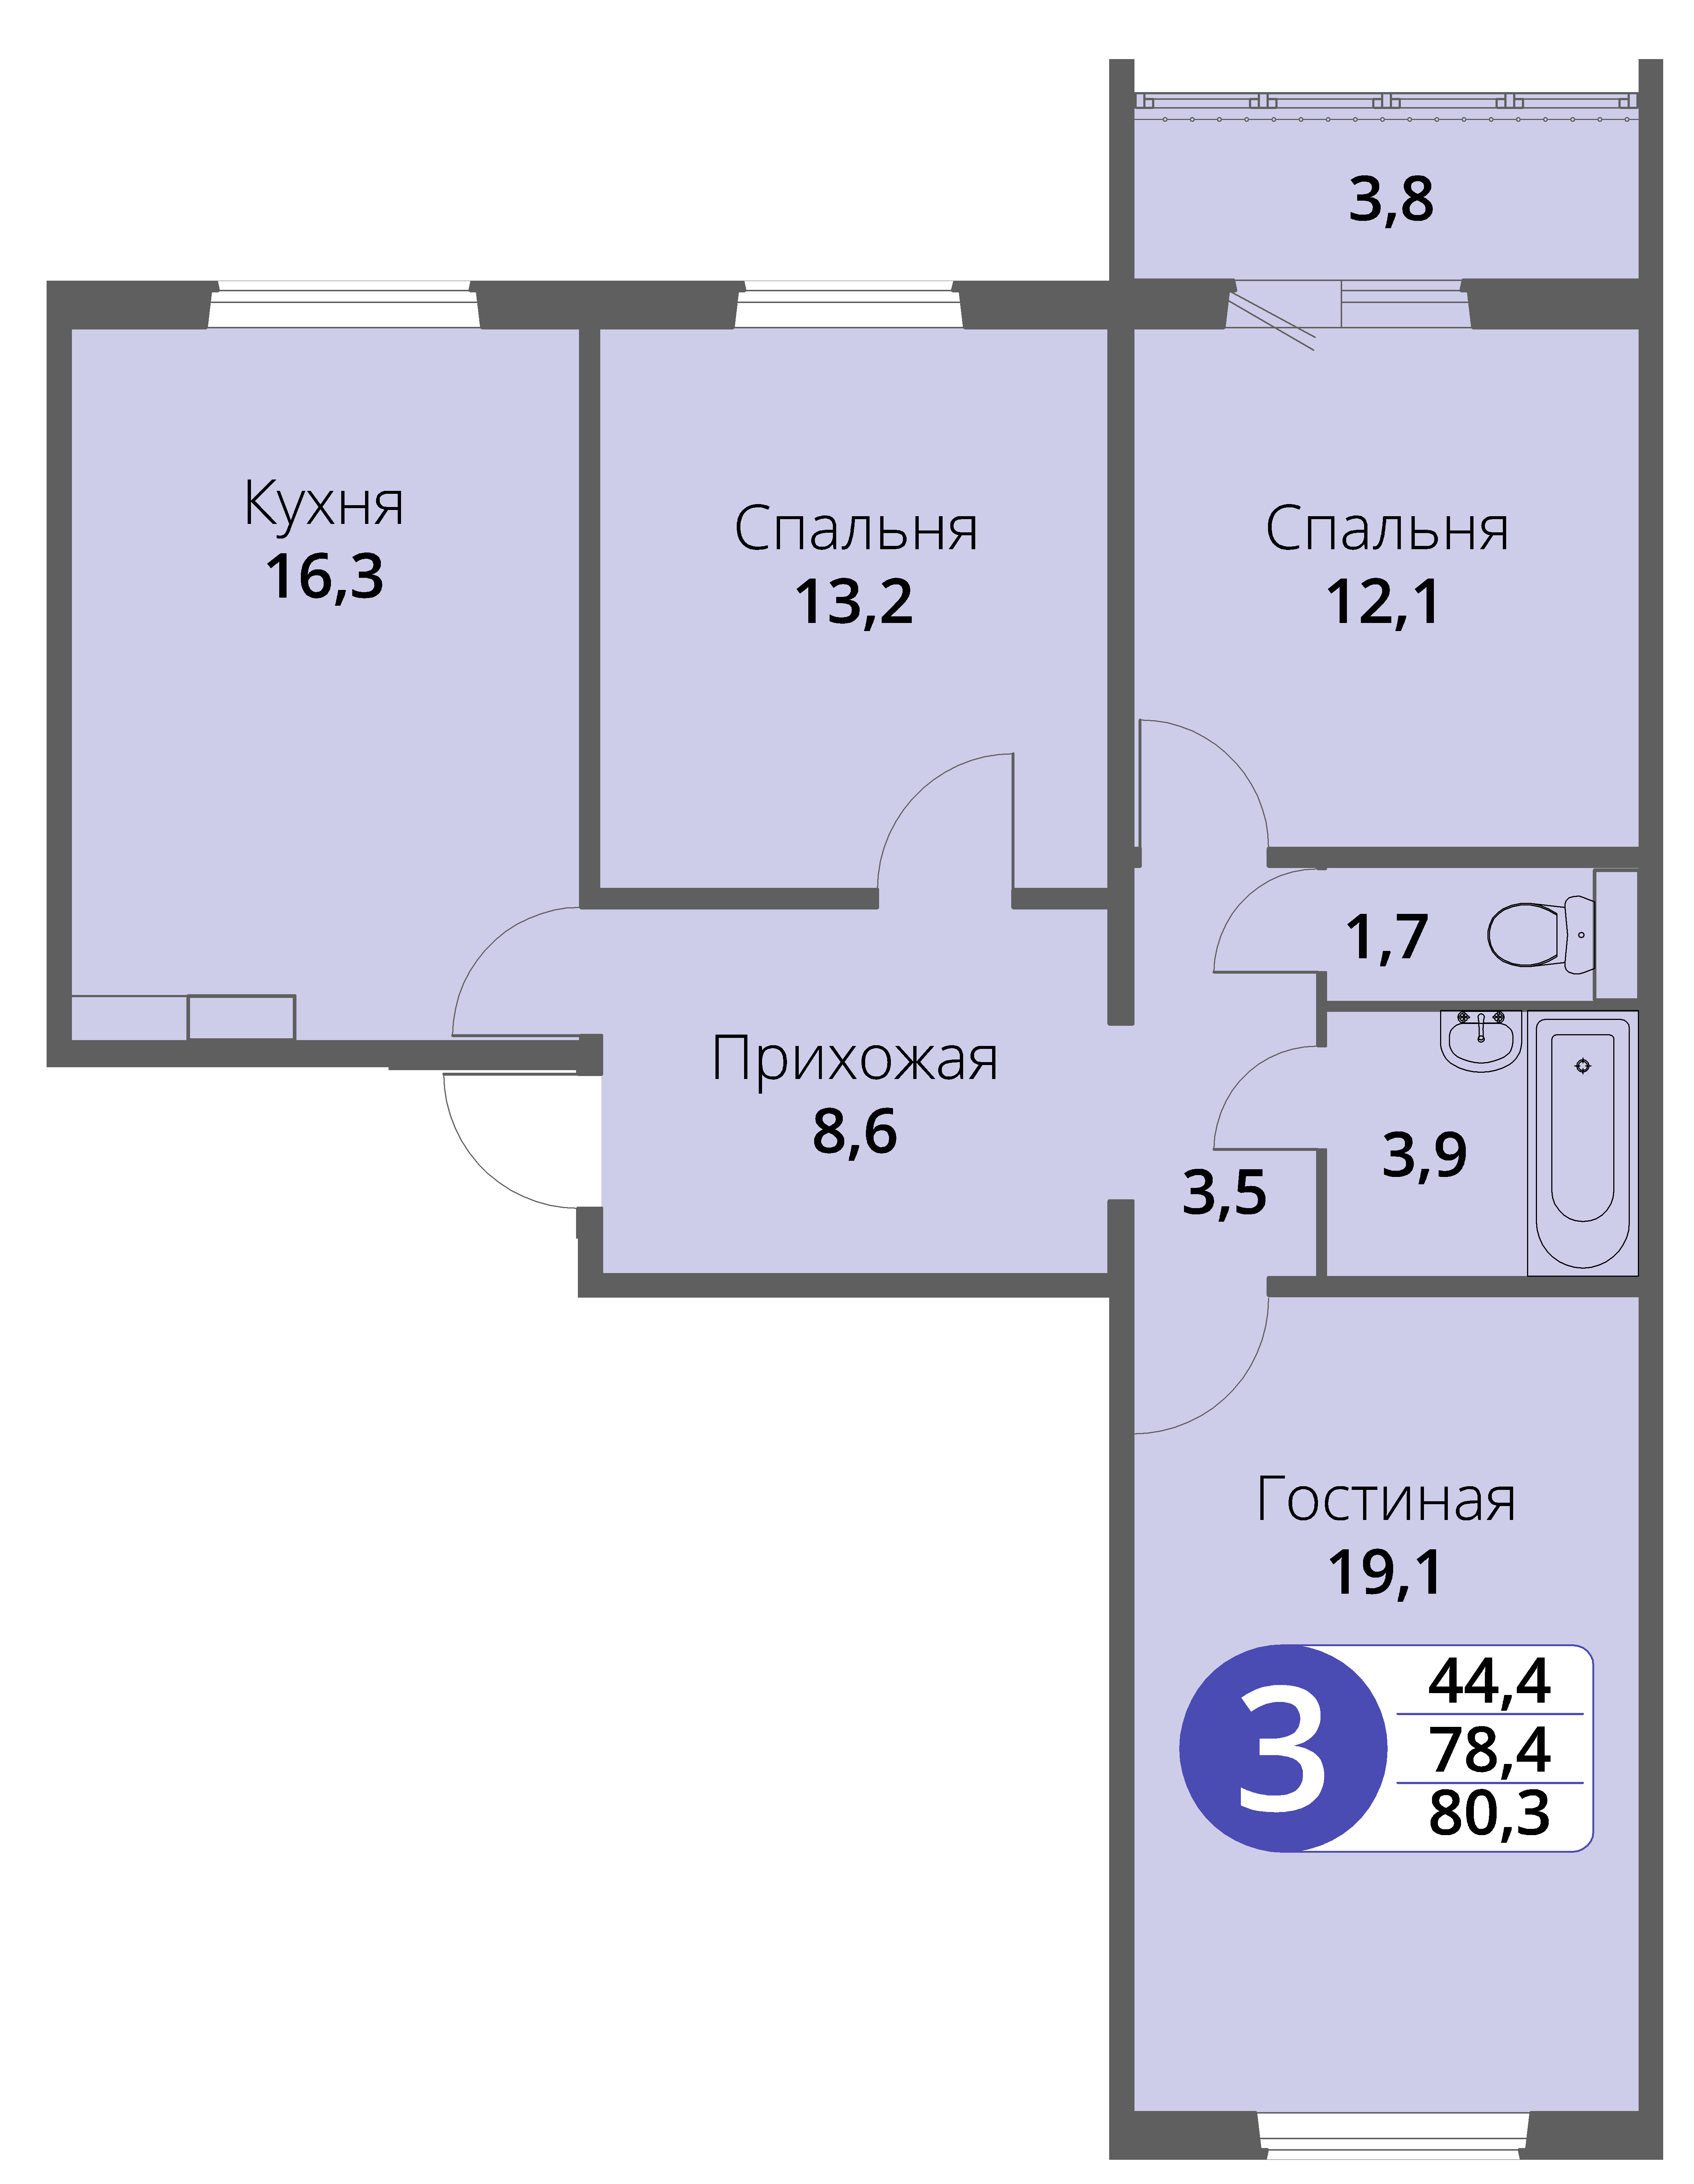 Зареченская 1-1, квартира 126 - Трехкомнатная